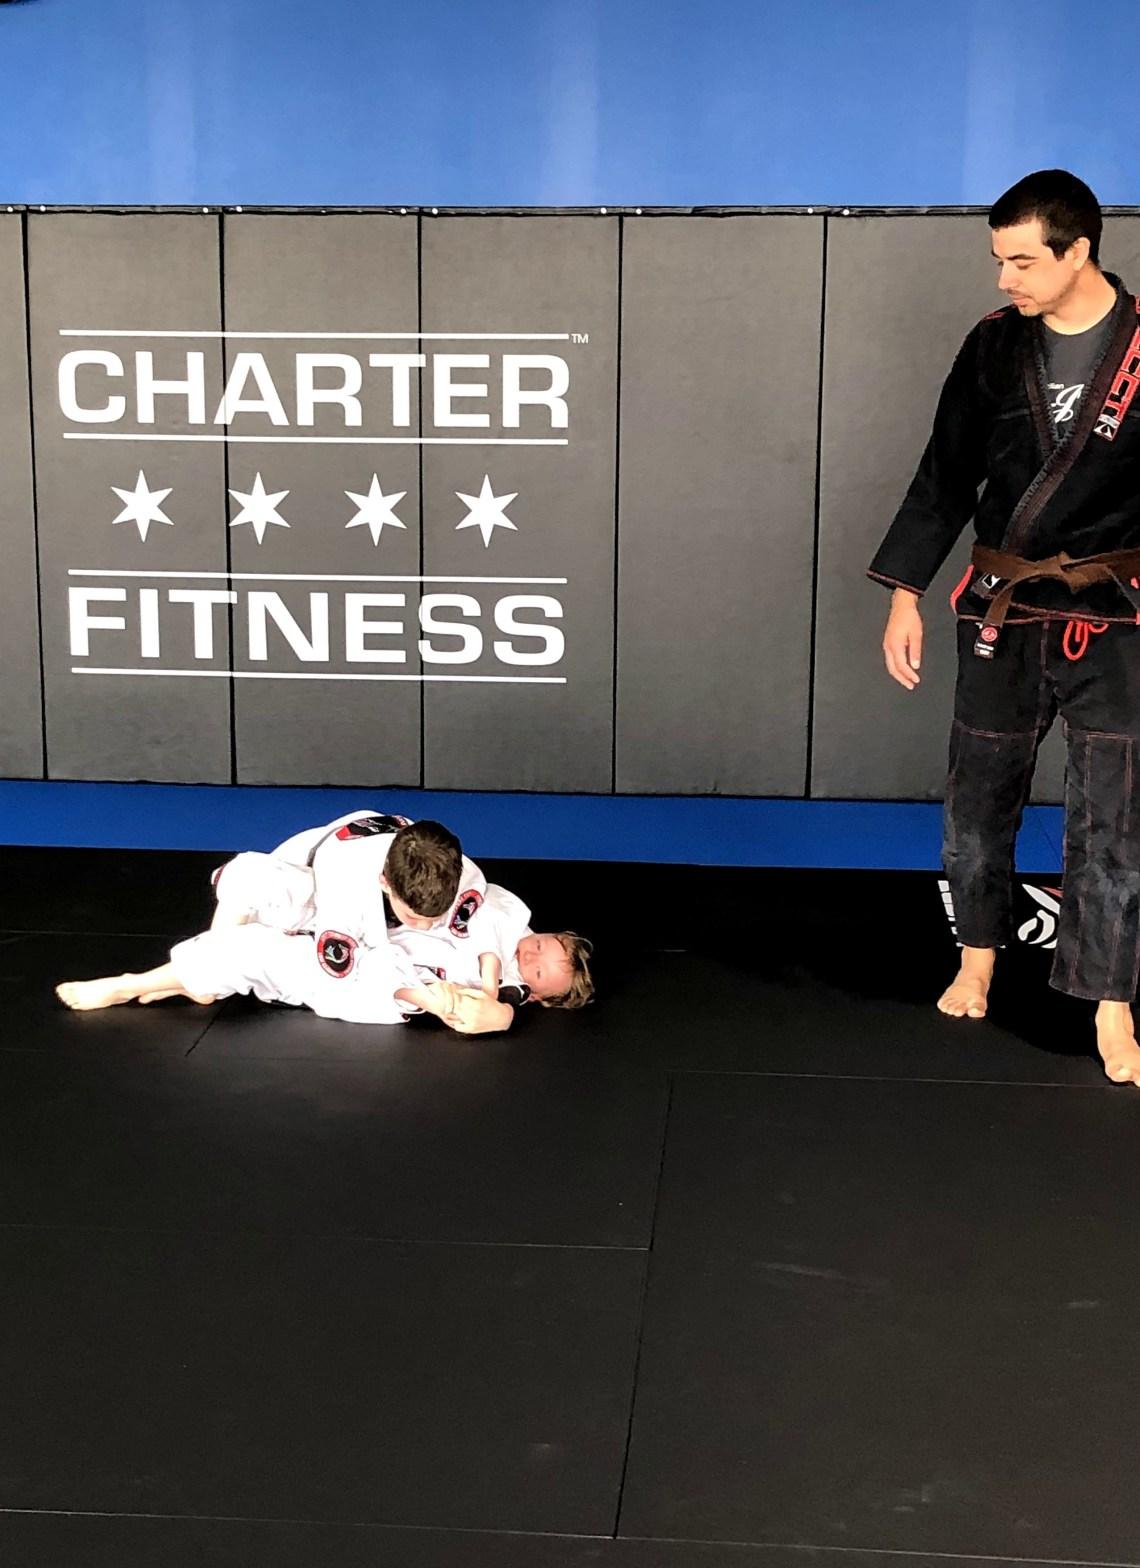 Jiu-Jitsu @ Charter Fitness Mundelein – Rothwell Mixed Martial Arts